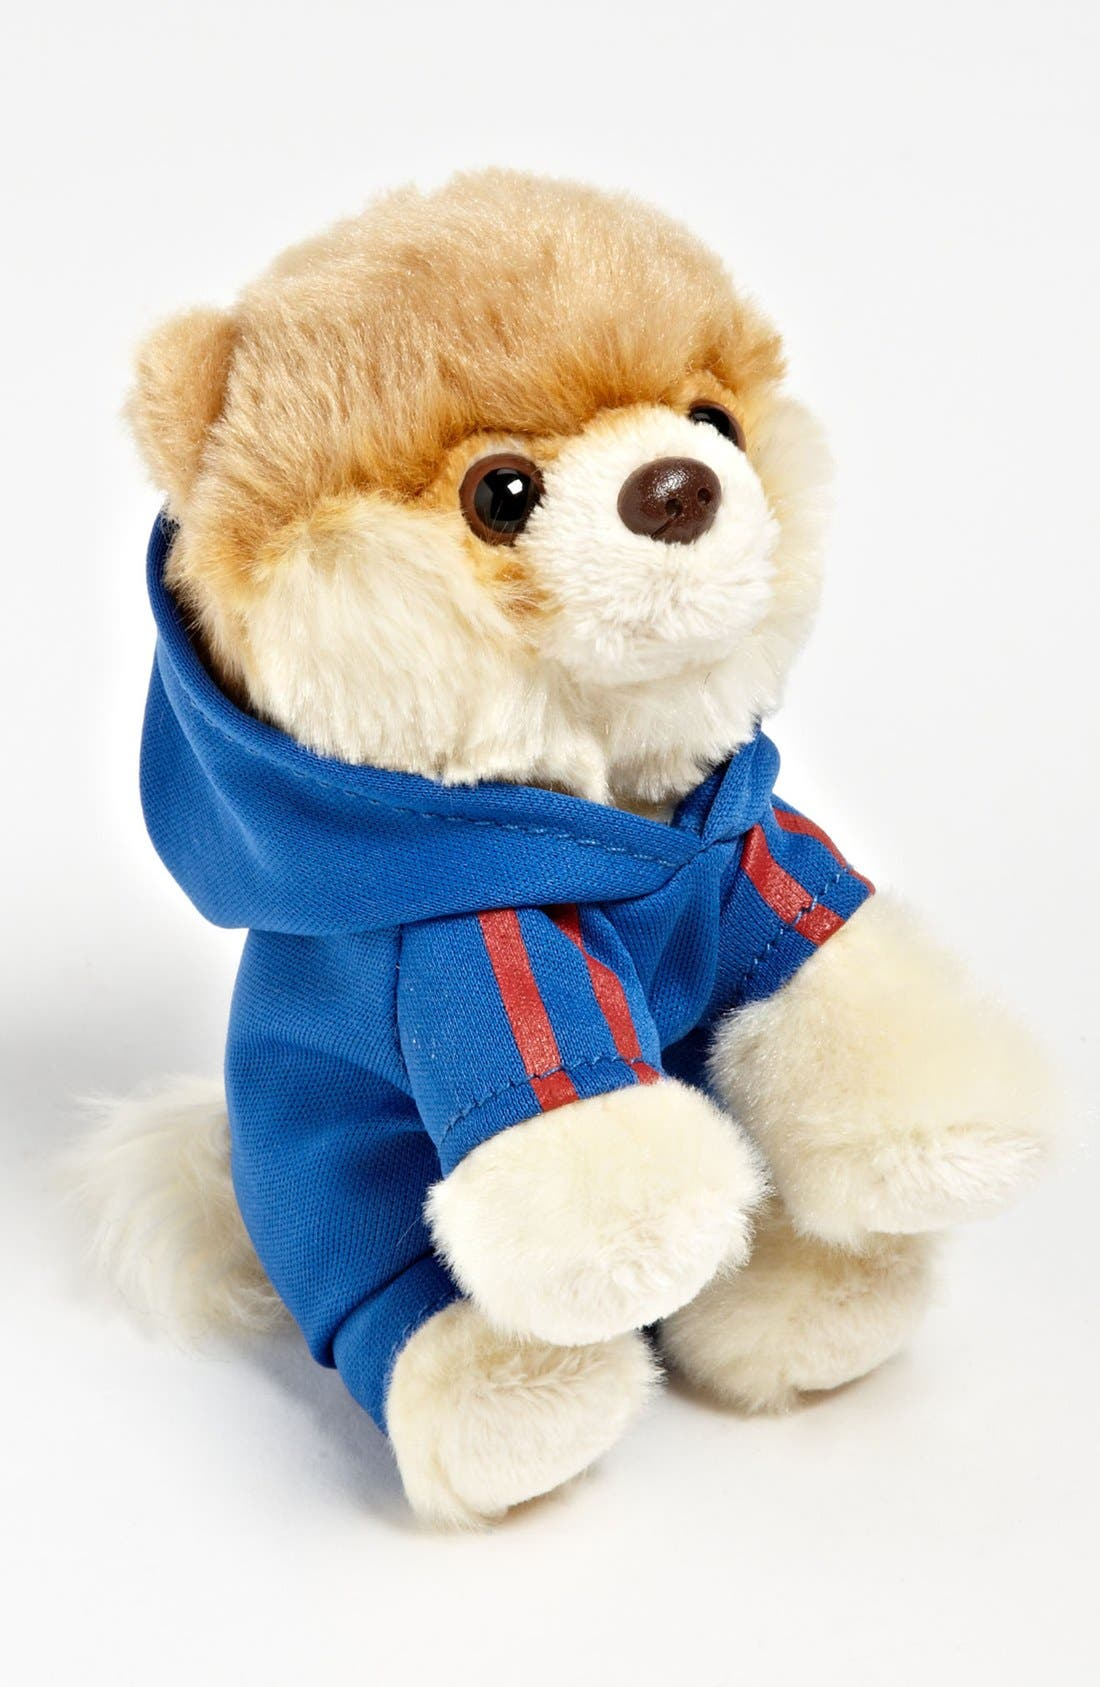 Alternate Image 1 Selected - Gund 'Itty Bitty Boo' Stuffed Animal